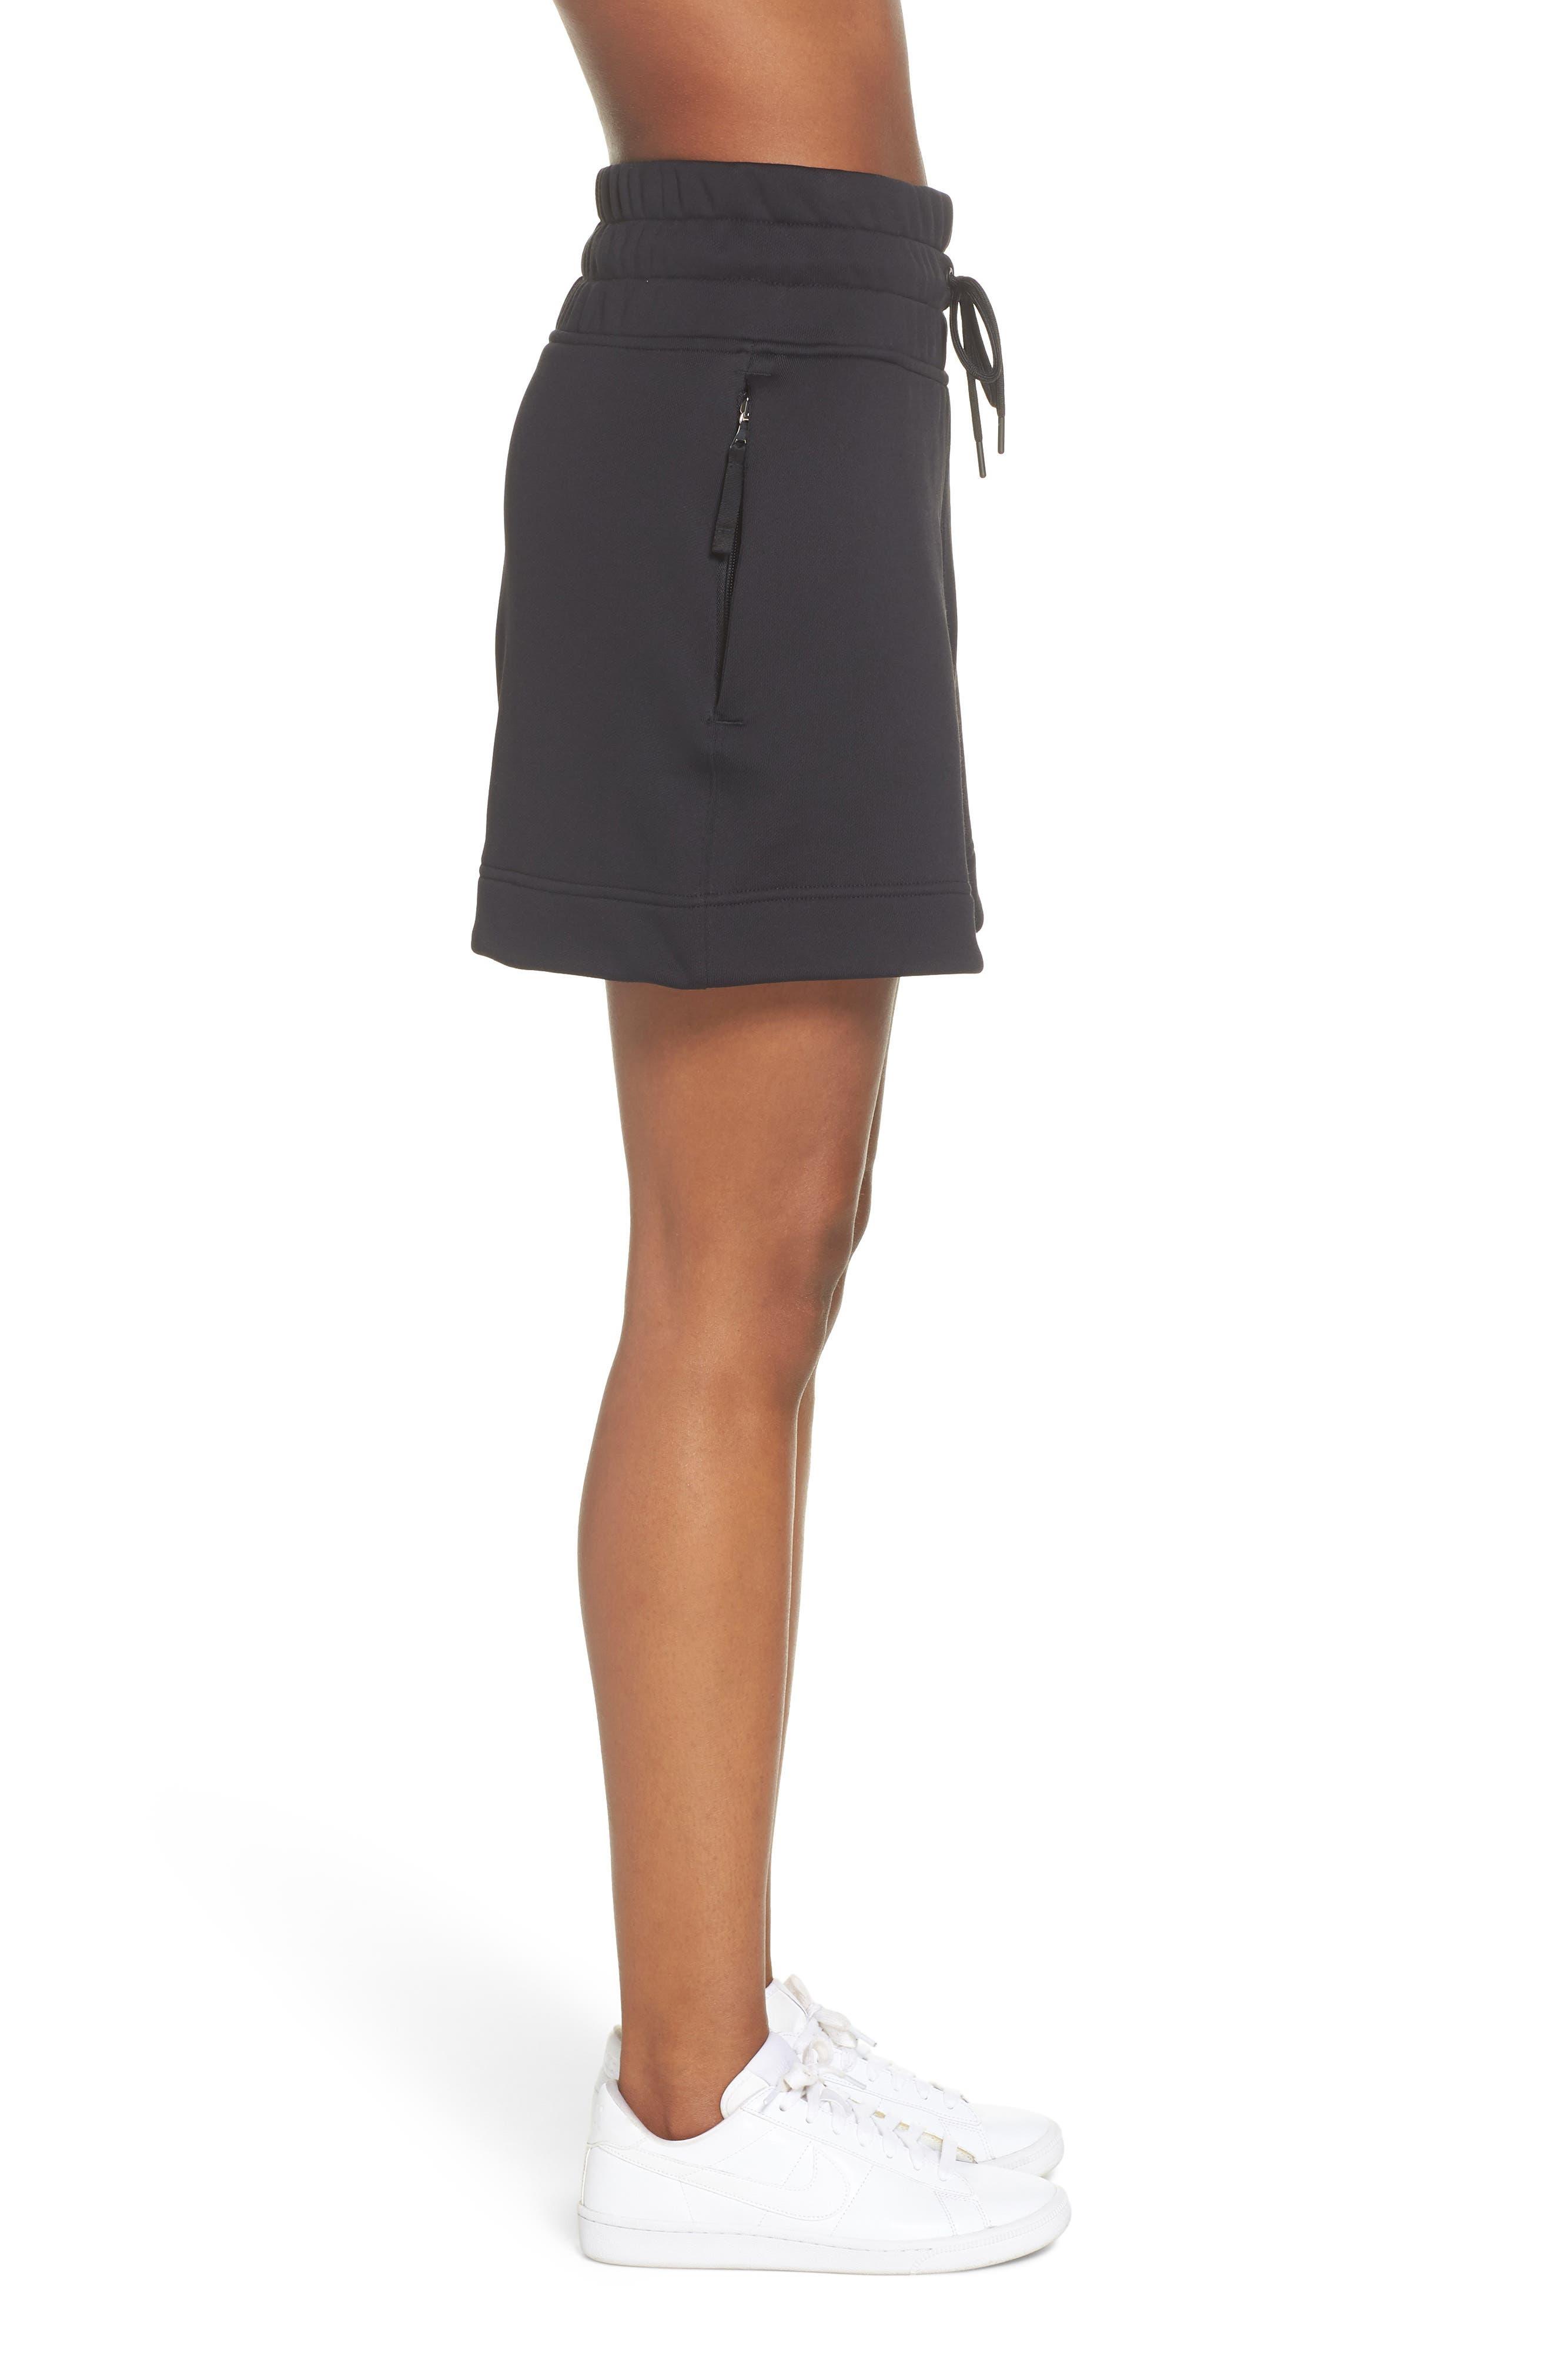 NikeLab Collection Women's Fleece Shorts,                             Alternate thumbnail 3, color,                             BLACK/ BLACK